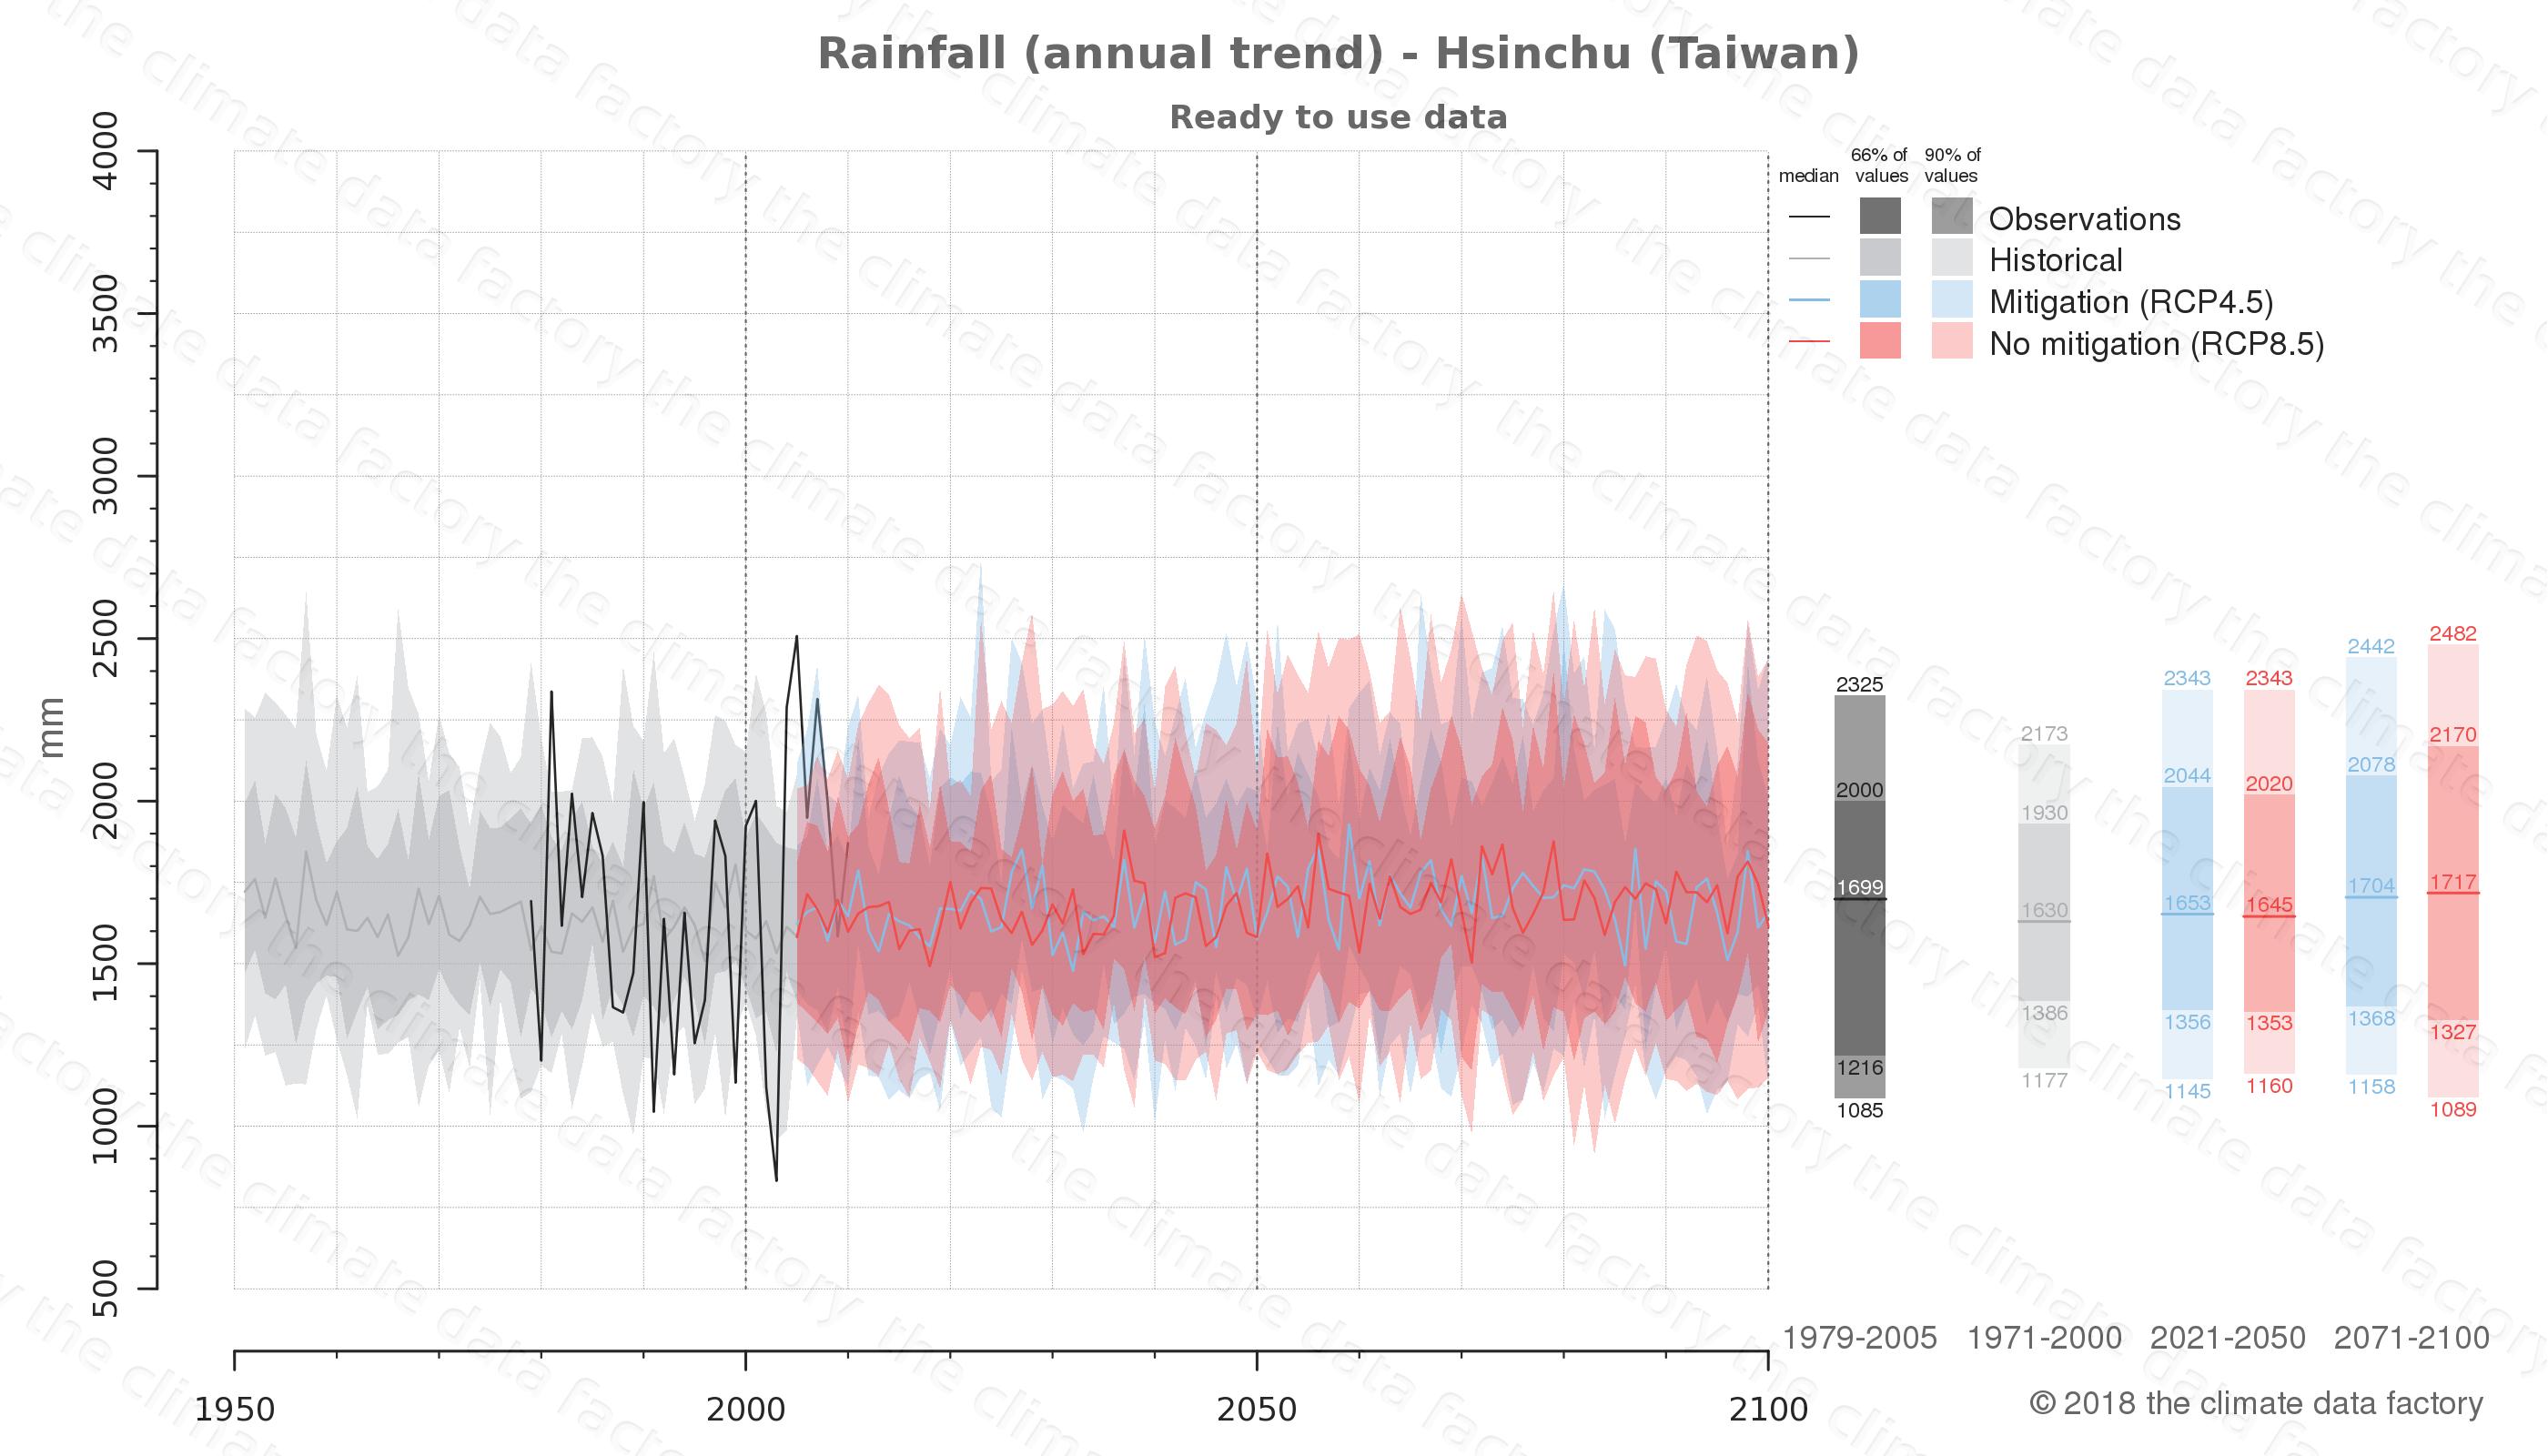 climate change data policy adaptation climate graph city data rainfall hsinchu taiwan